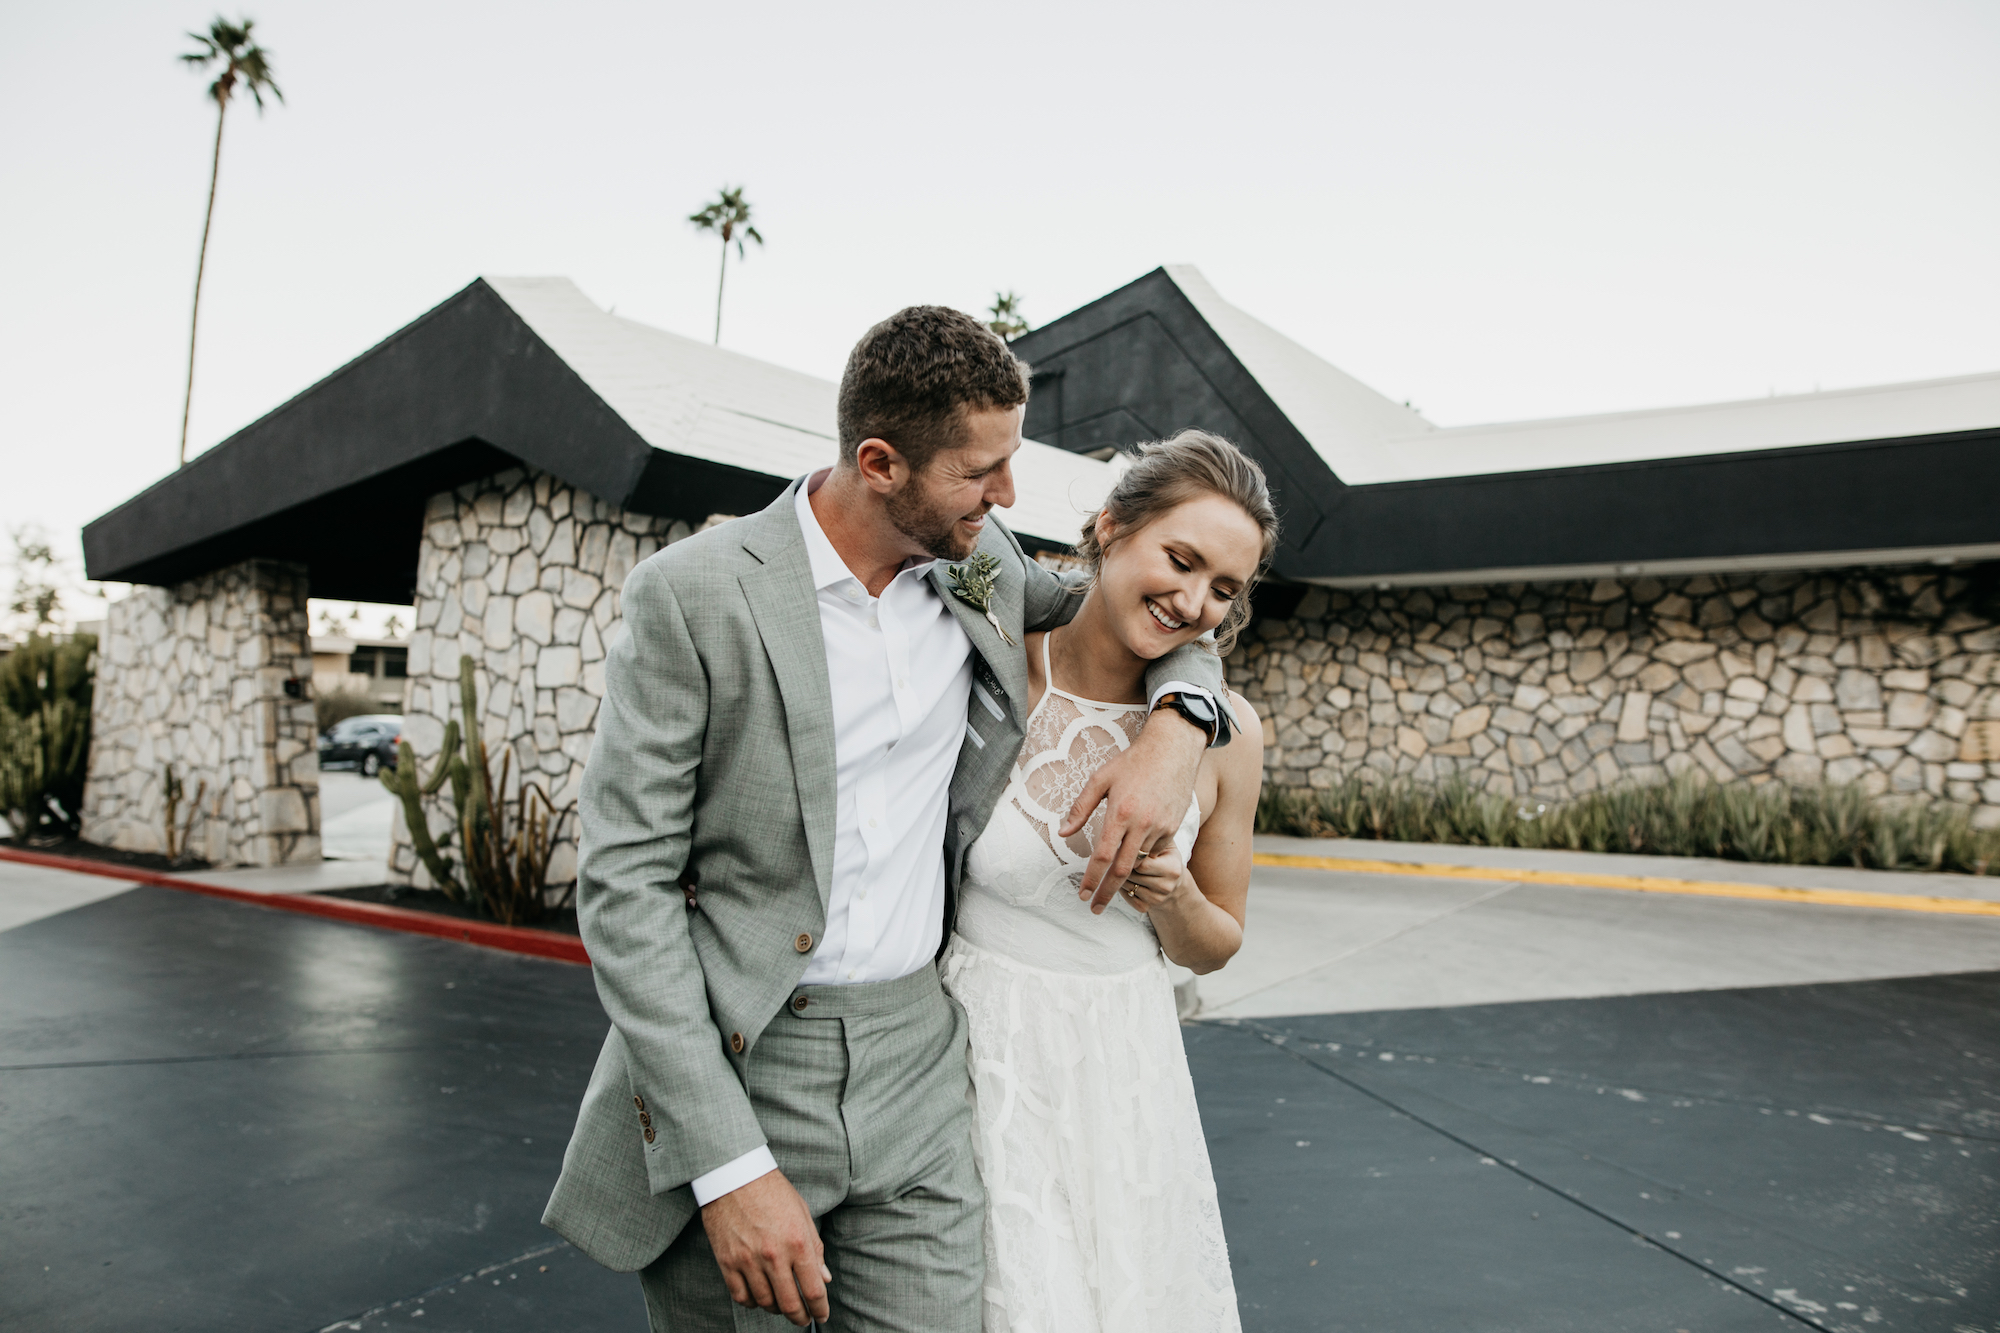 ace-hotel-palm-springs-wedding-photographer669.jpg